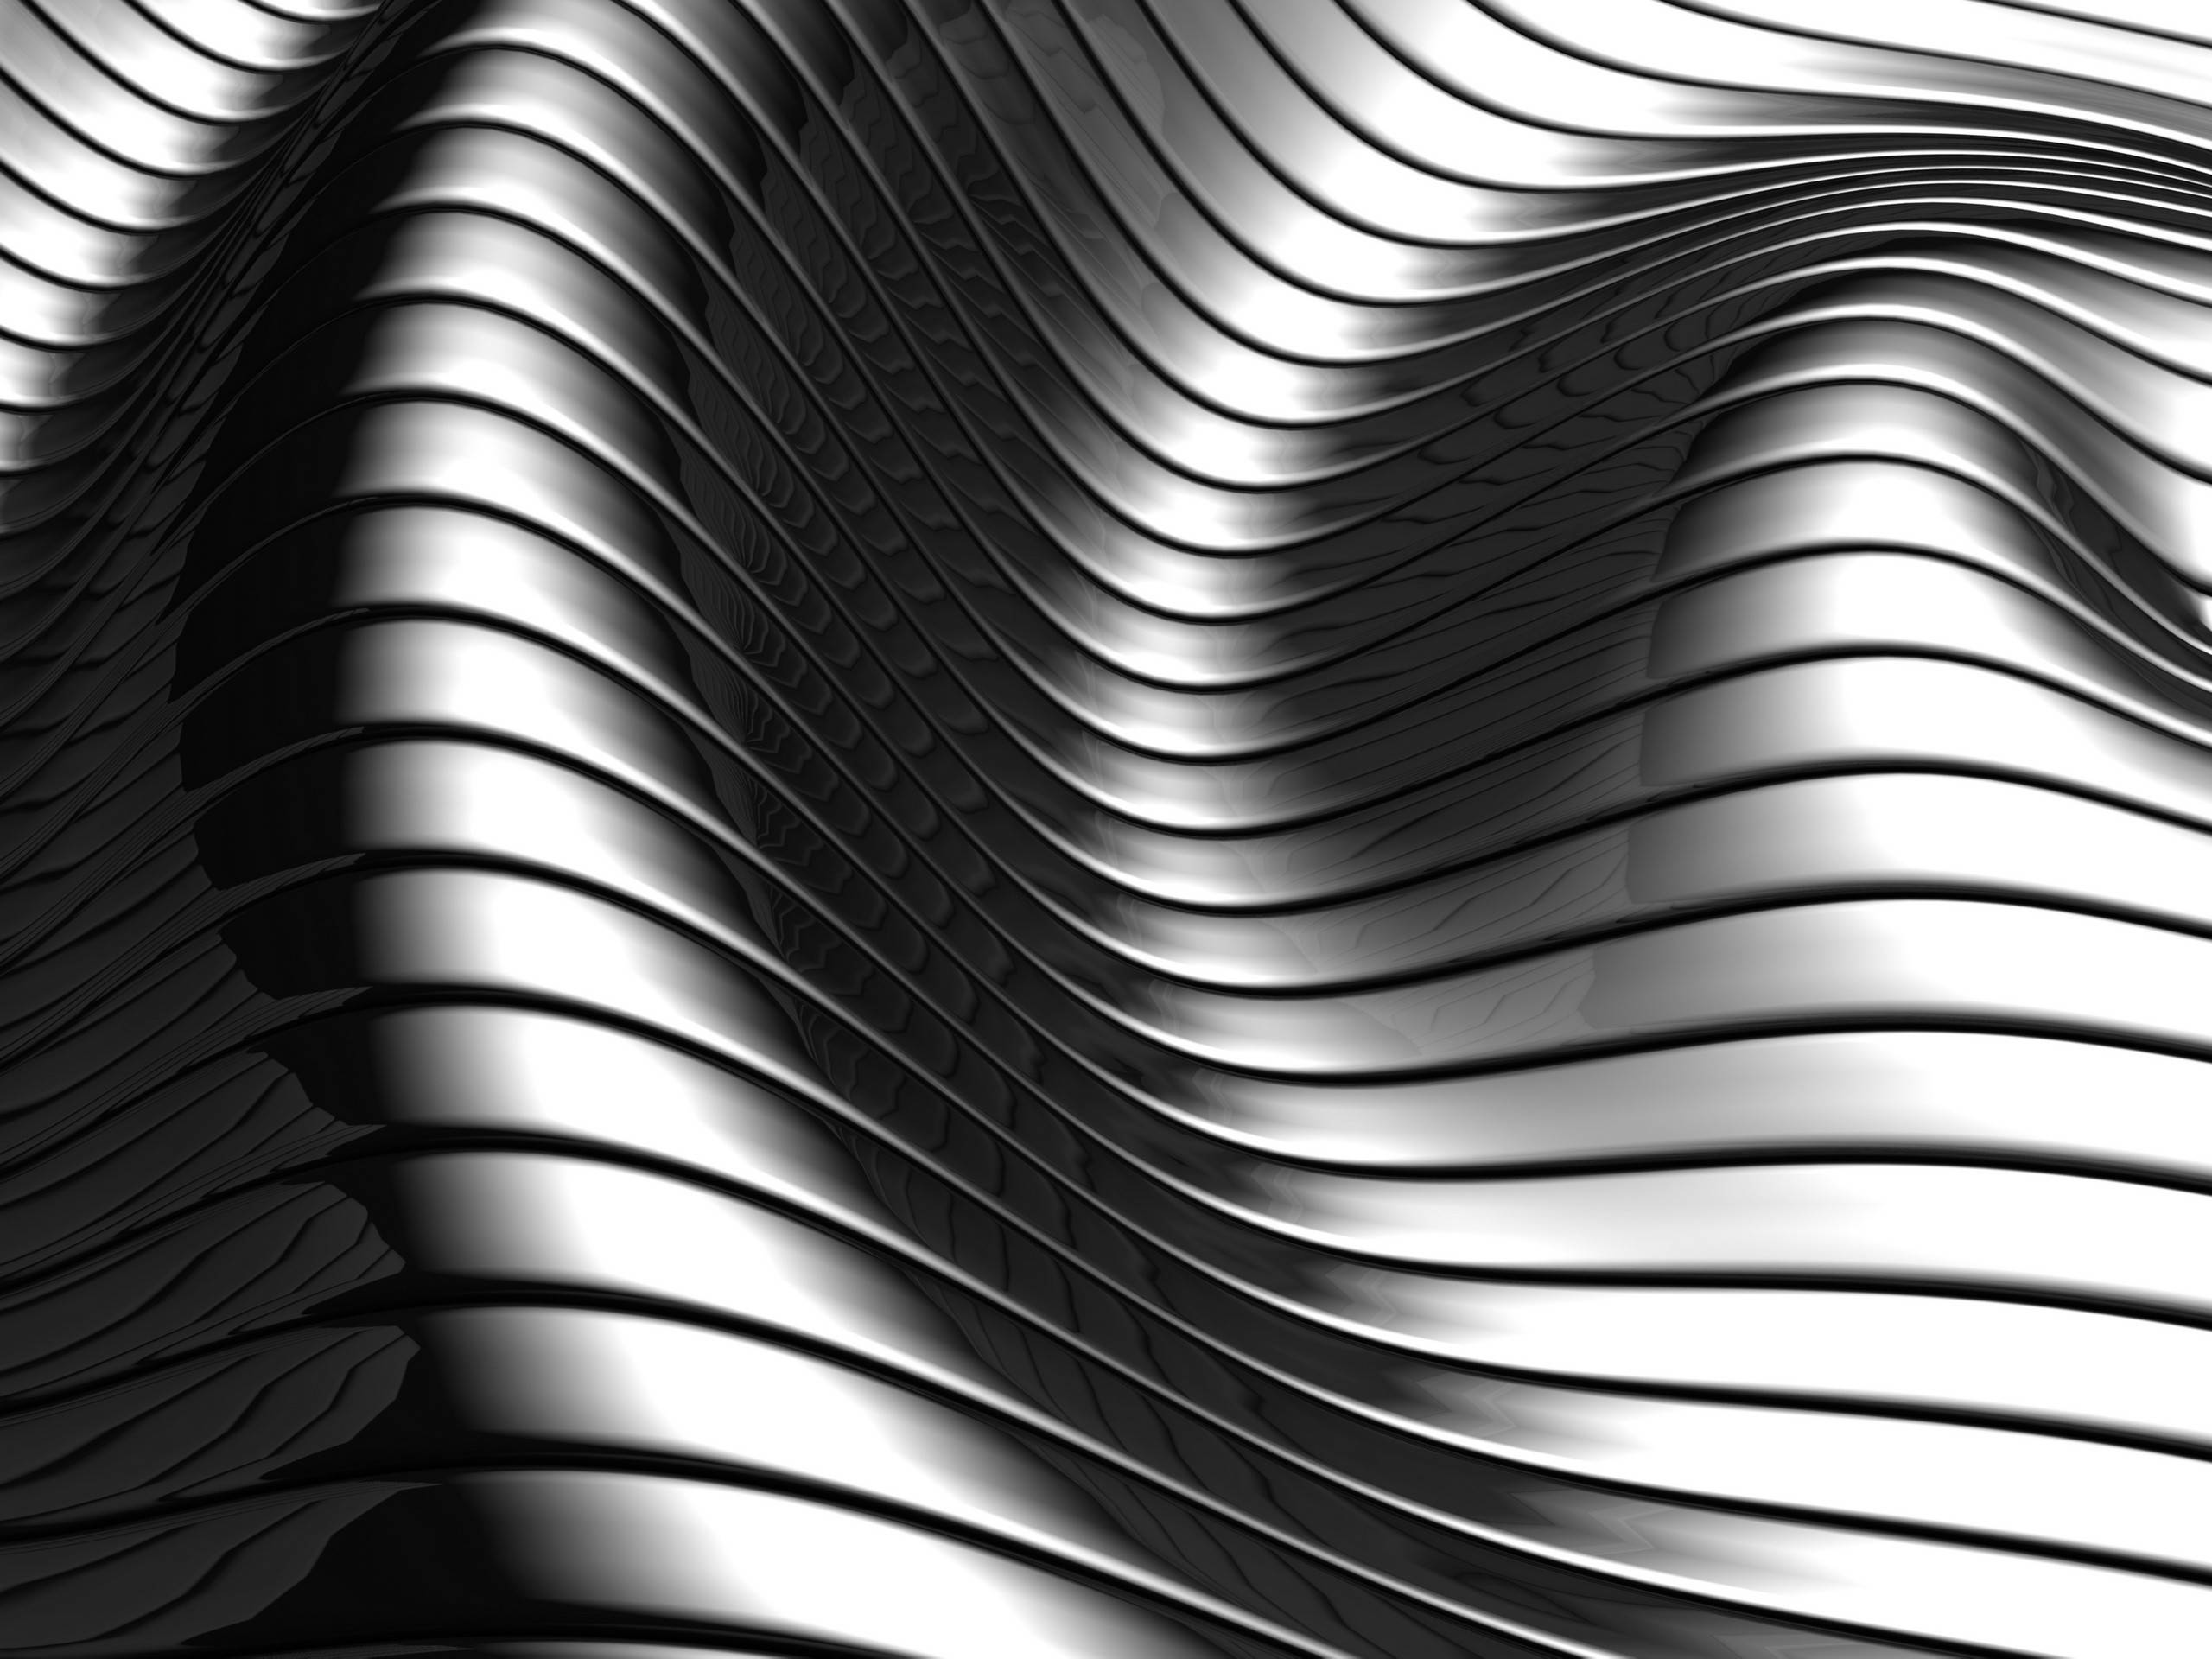 metallic wallpaper designs 2015   Grasscloth Wallpaper 2560x1920